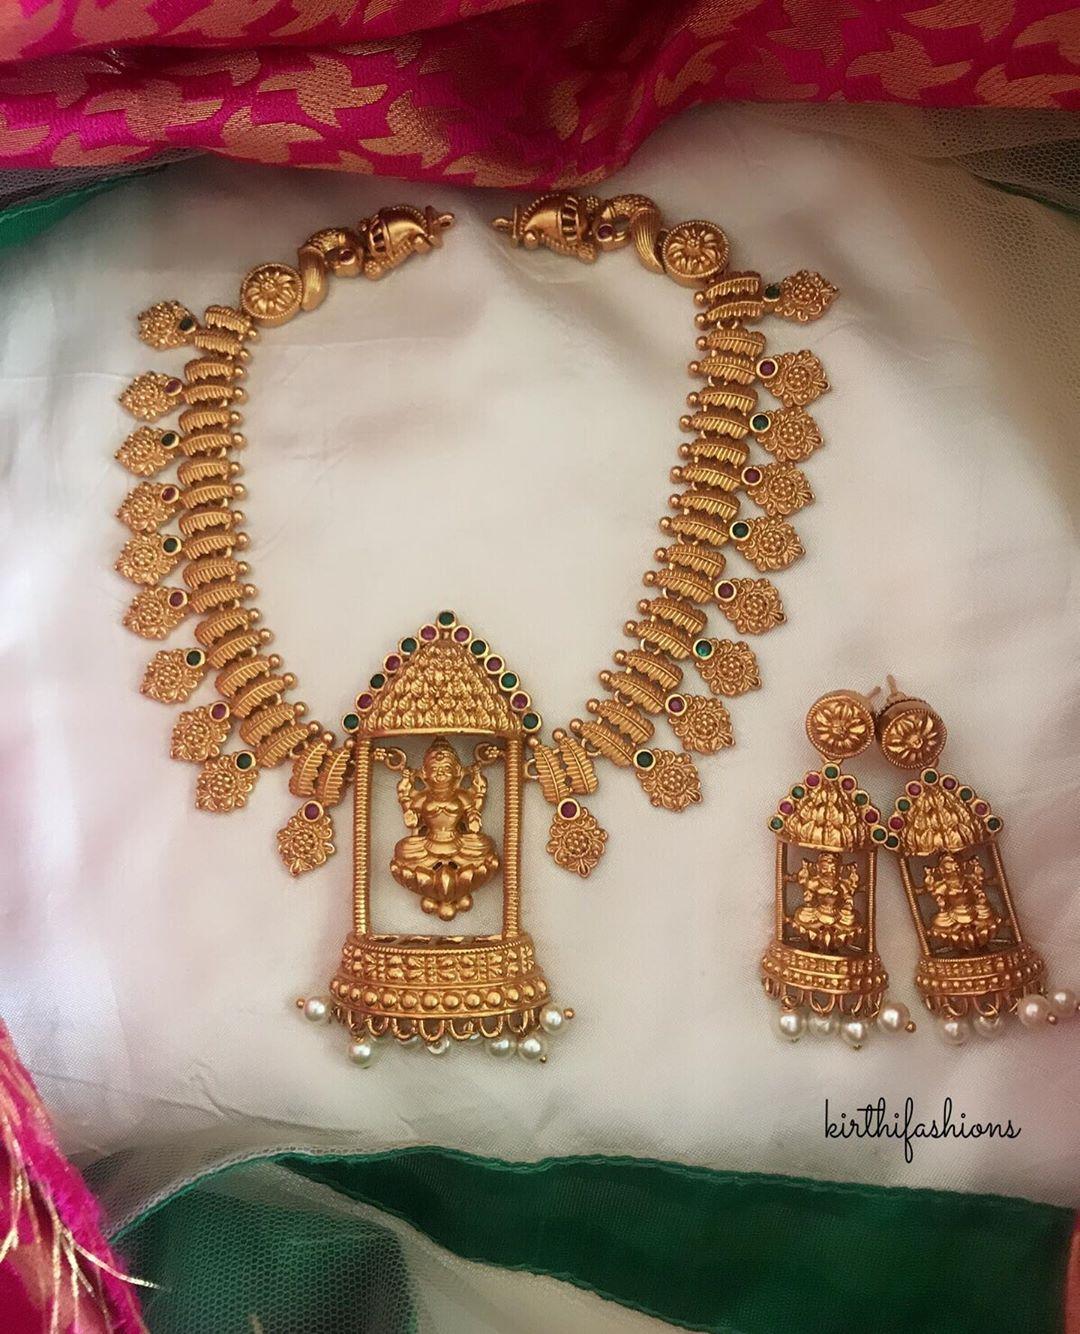 imitation-jewellery-online-shopping-6